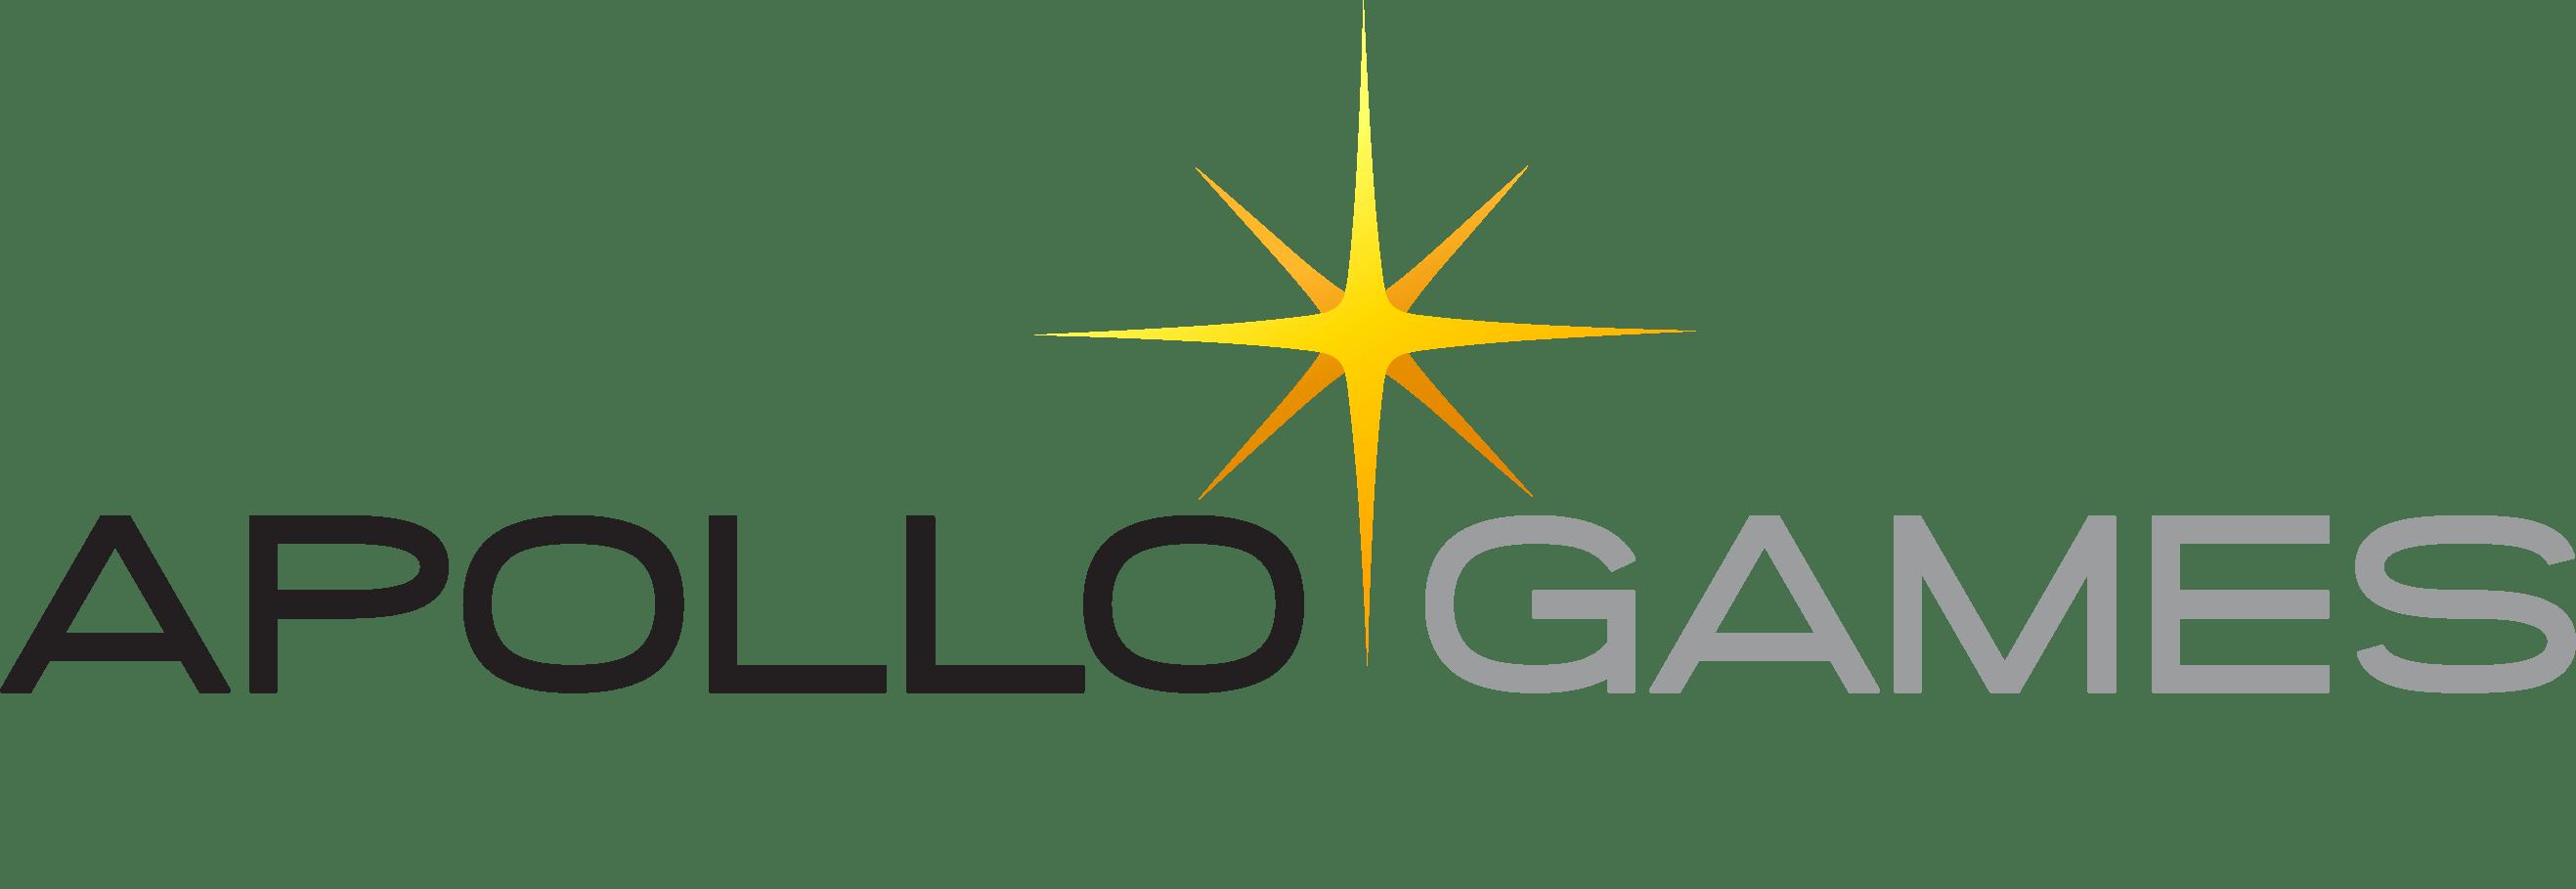 Apollo Games jogos